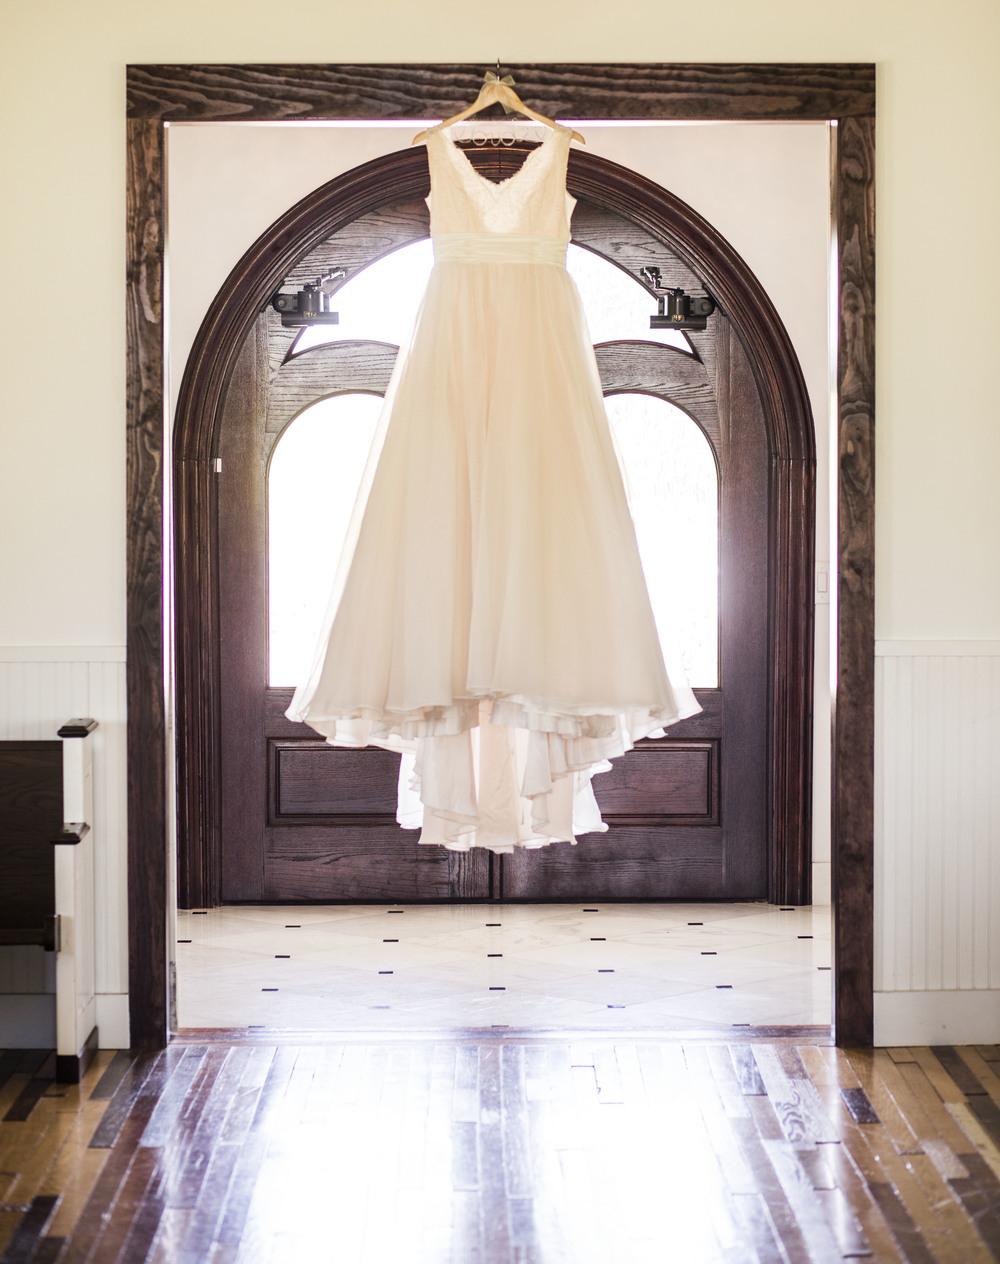 ATGI_Cory & Jackie Wedding_2S8A1243.jpg